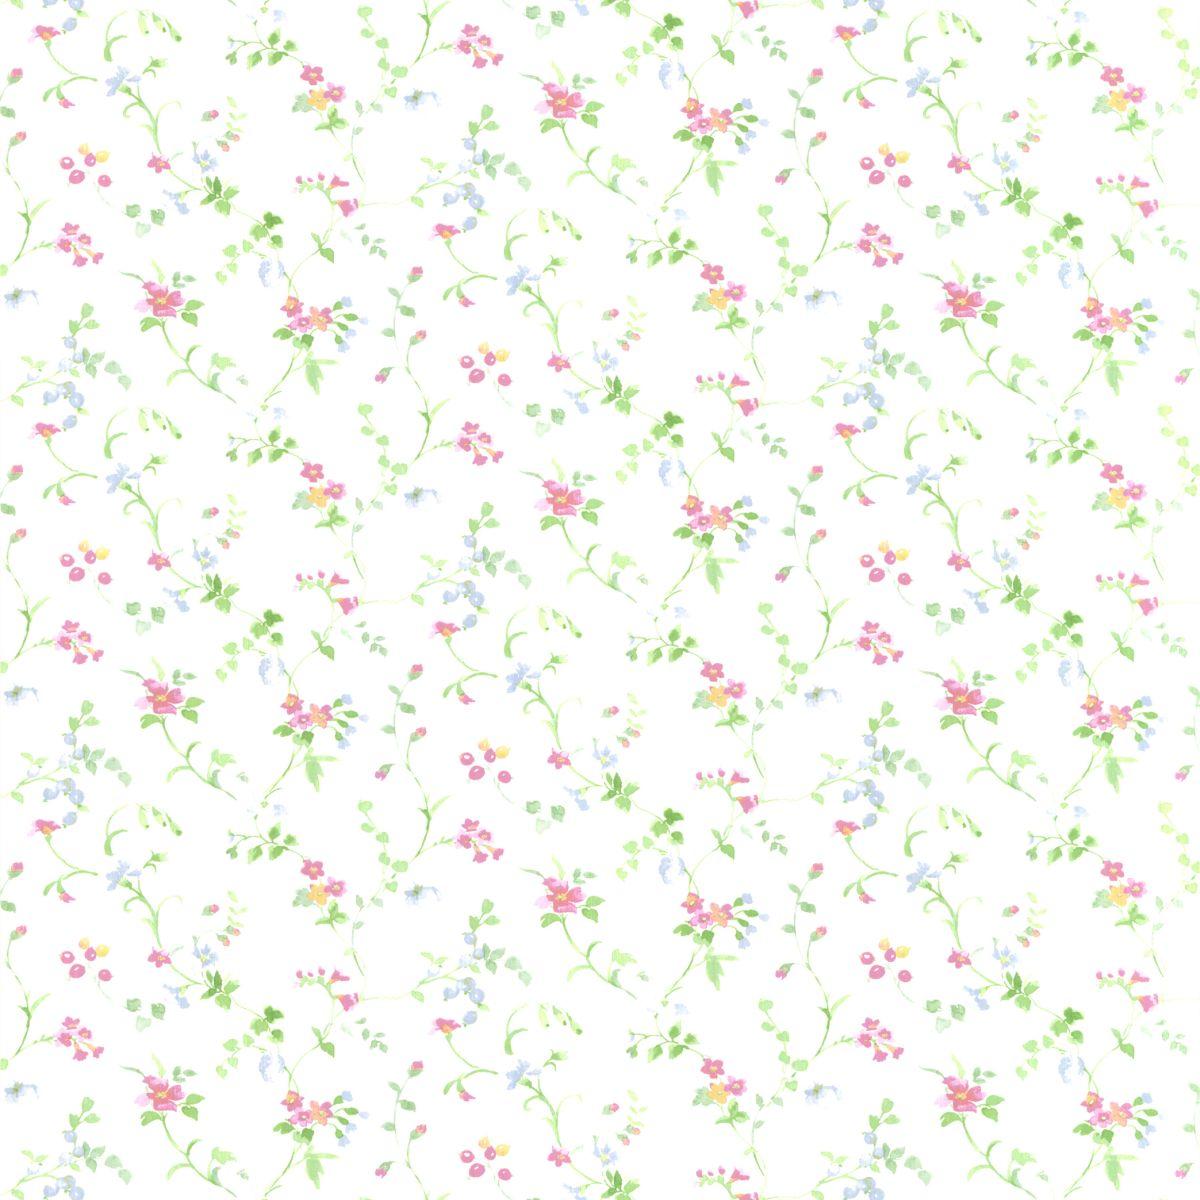 Florale Tapeten G?nstig : Florale Muster Moderne Tapeten Pictures to pin on Pinterest